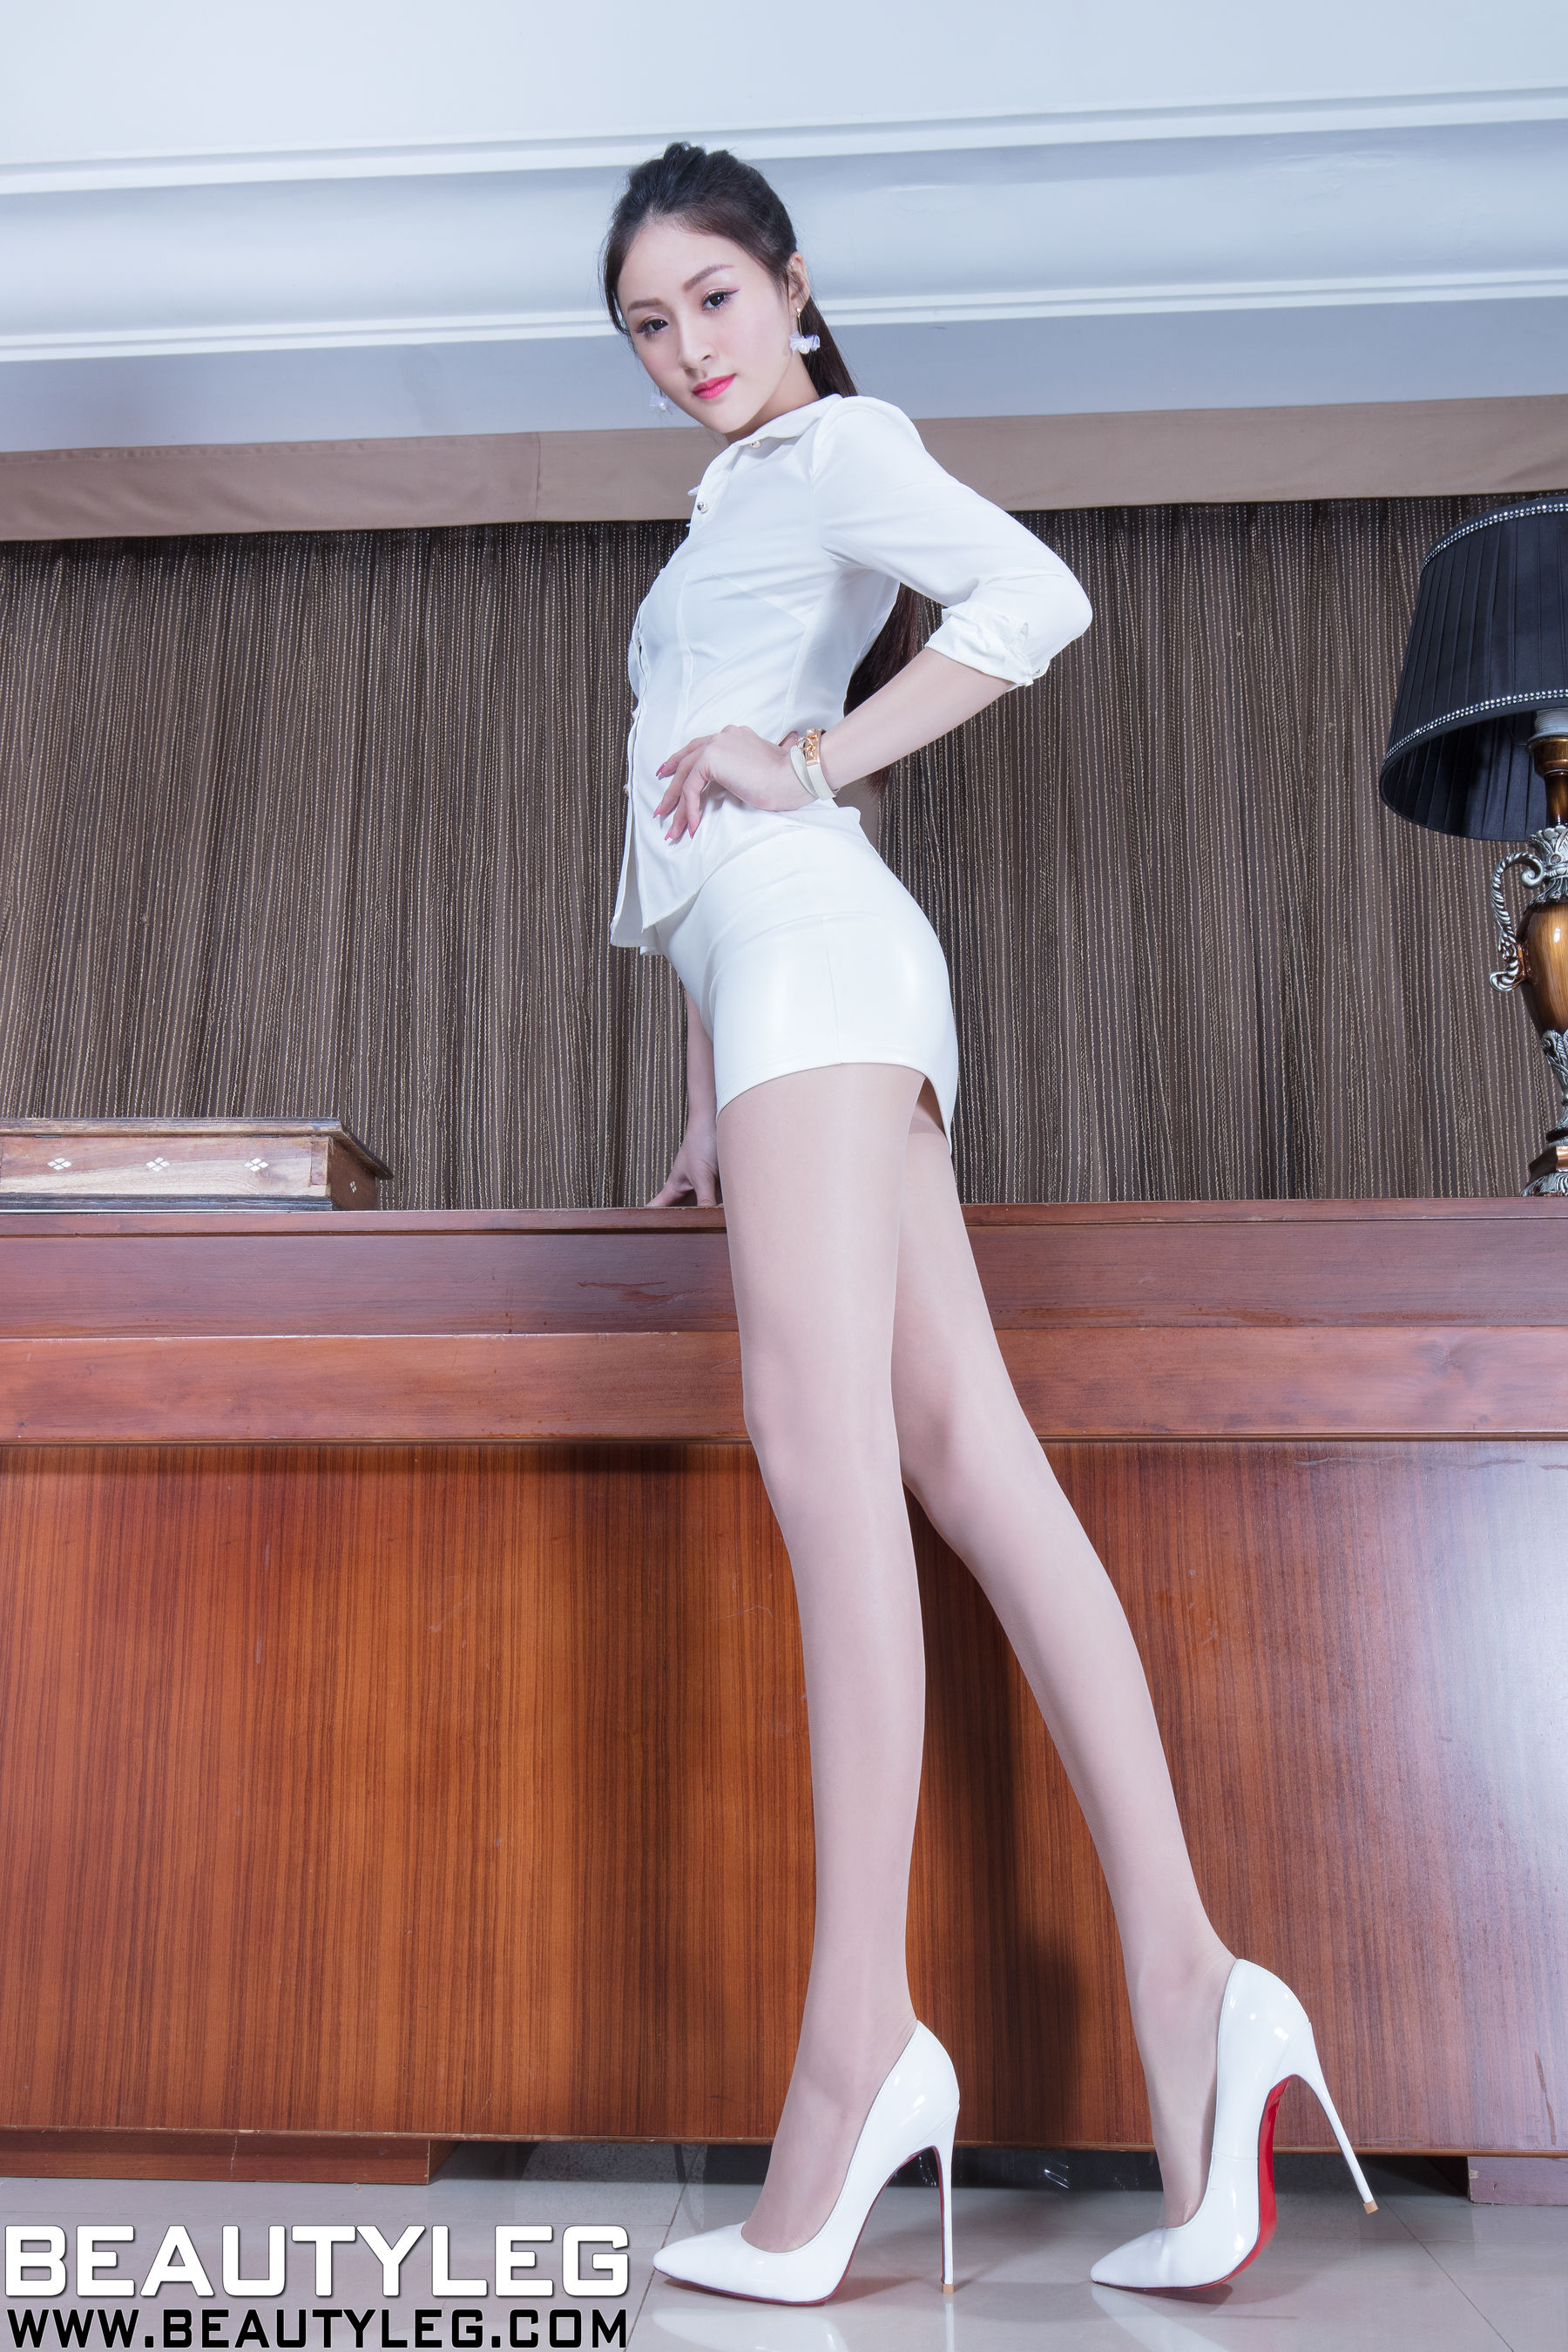 VOL.1787 [Beautyleg]OL美女包臀裙美女长腿美女:Lola雪岑(腿模Lola)超高清个人性感漂亮大图(46P)